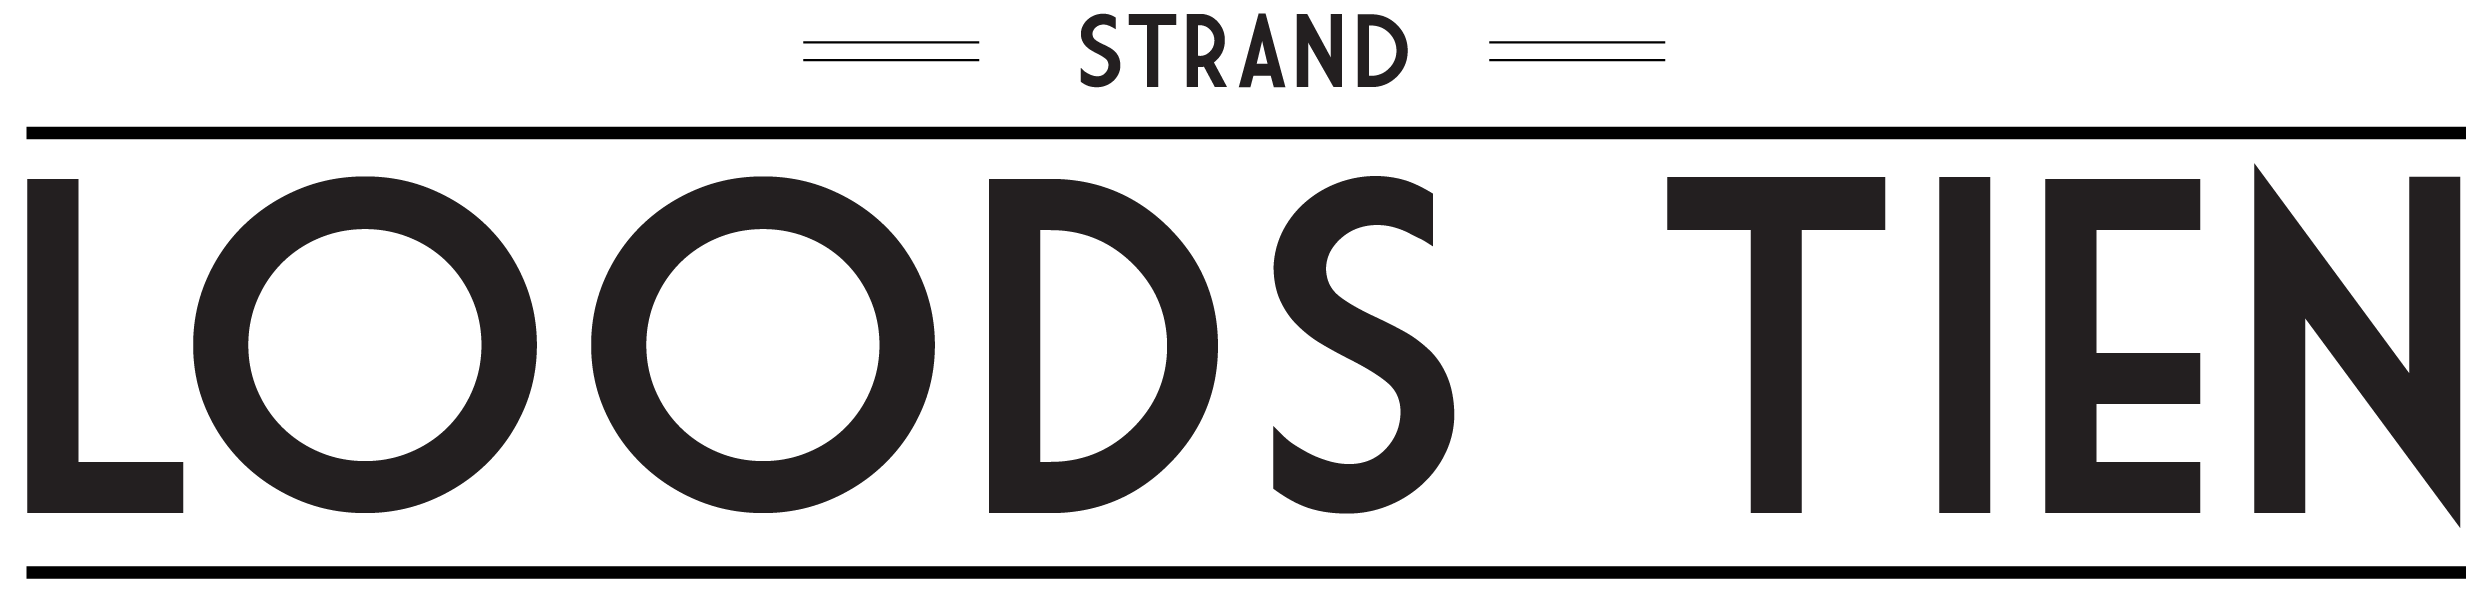 Strand Loods Tien Breskens alle dagen open